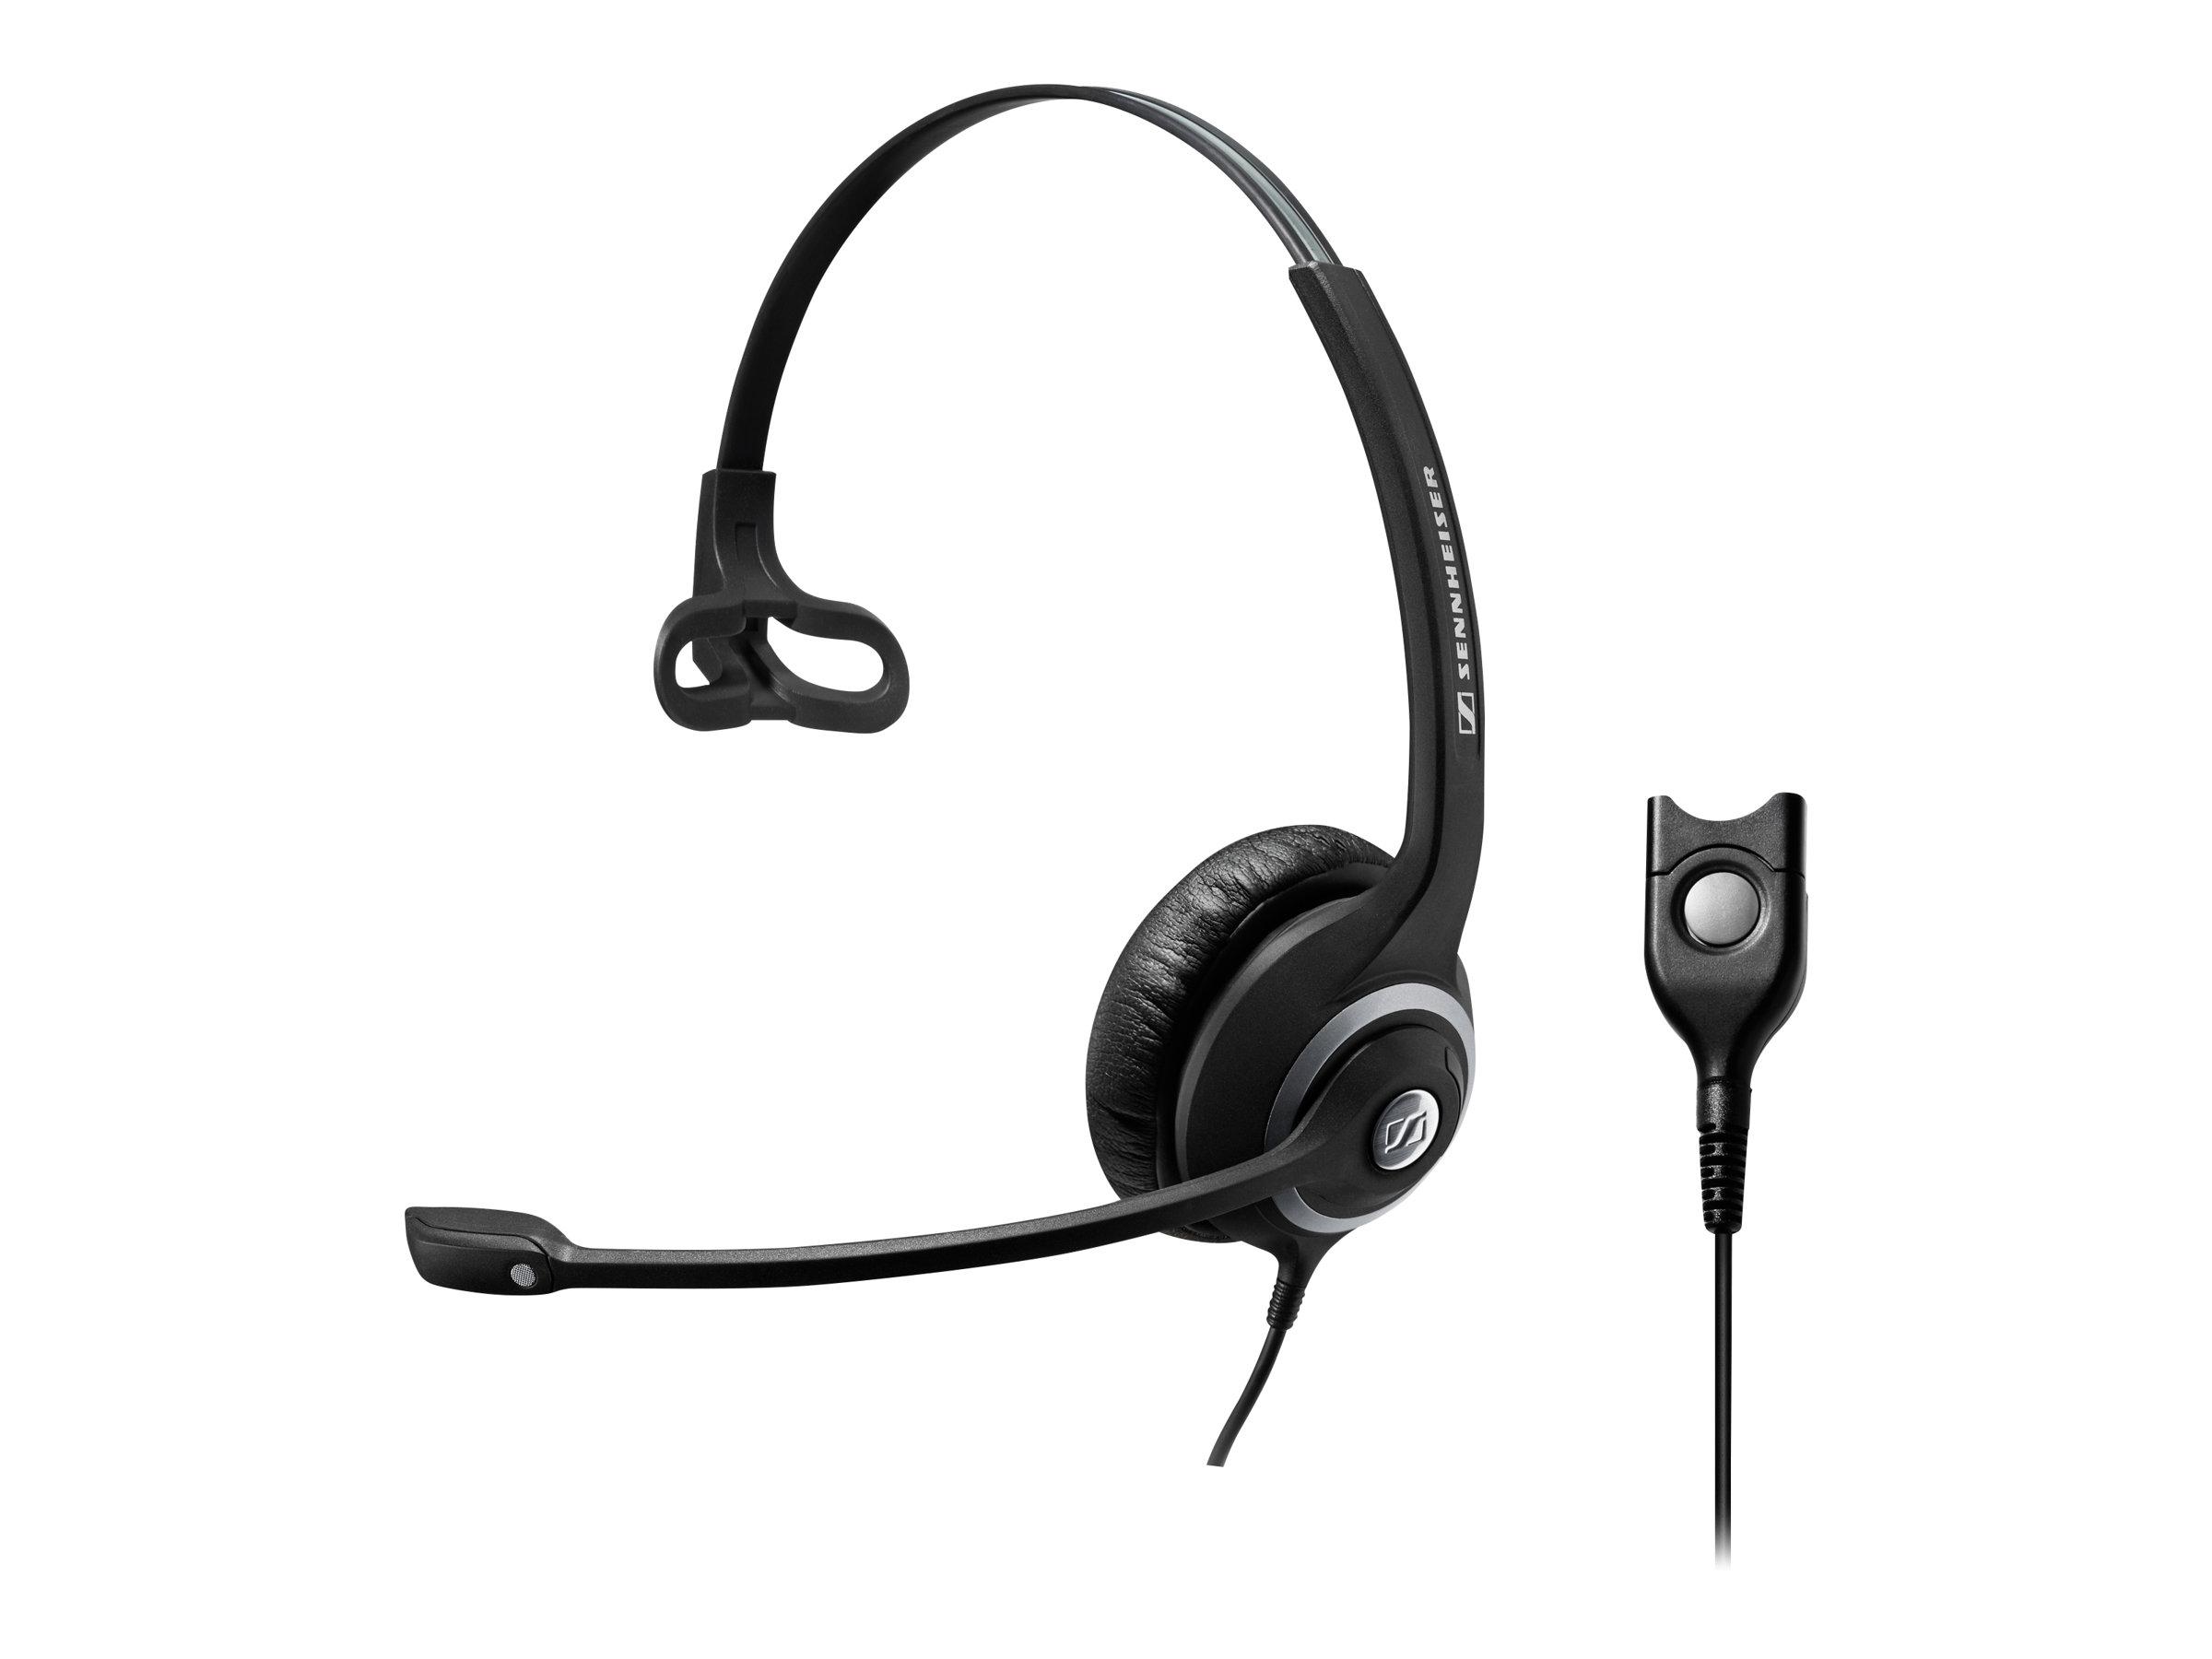 Sennheiser Circle SC 230 - Headset - On-Ear - kabelgebunden - aktive Rauschunterdrückung - Easy Disconnect